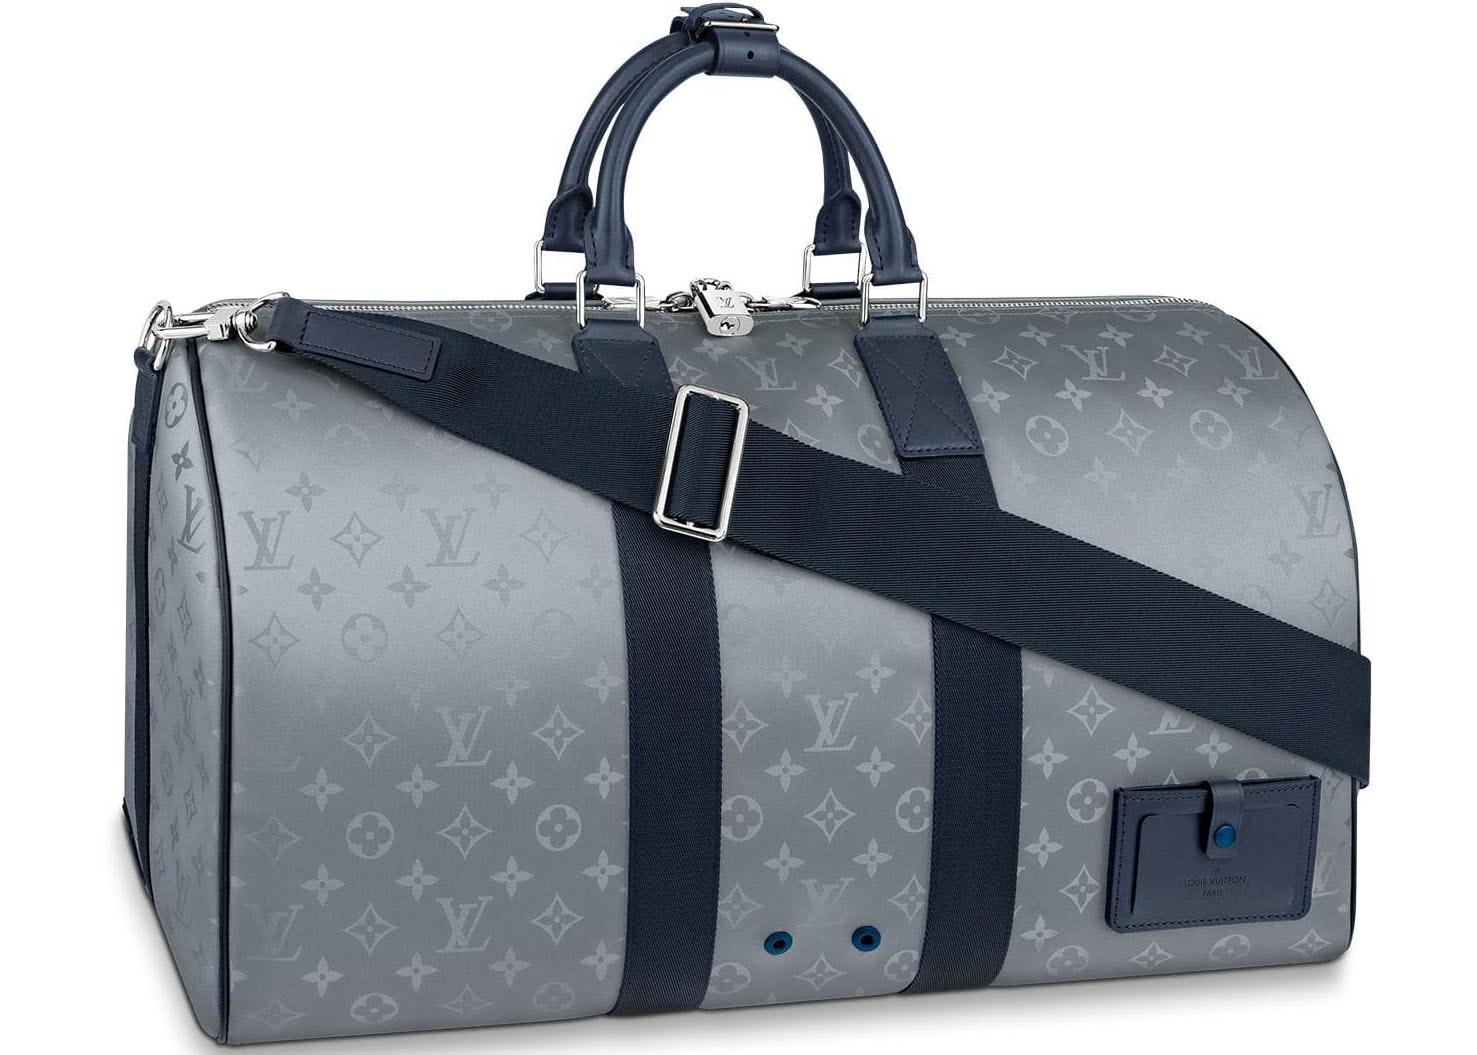 Louis Vuitton Keepall Bandouliere Monogram Satellite 50 Silver